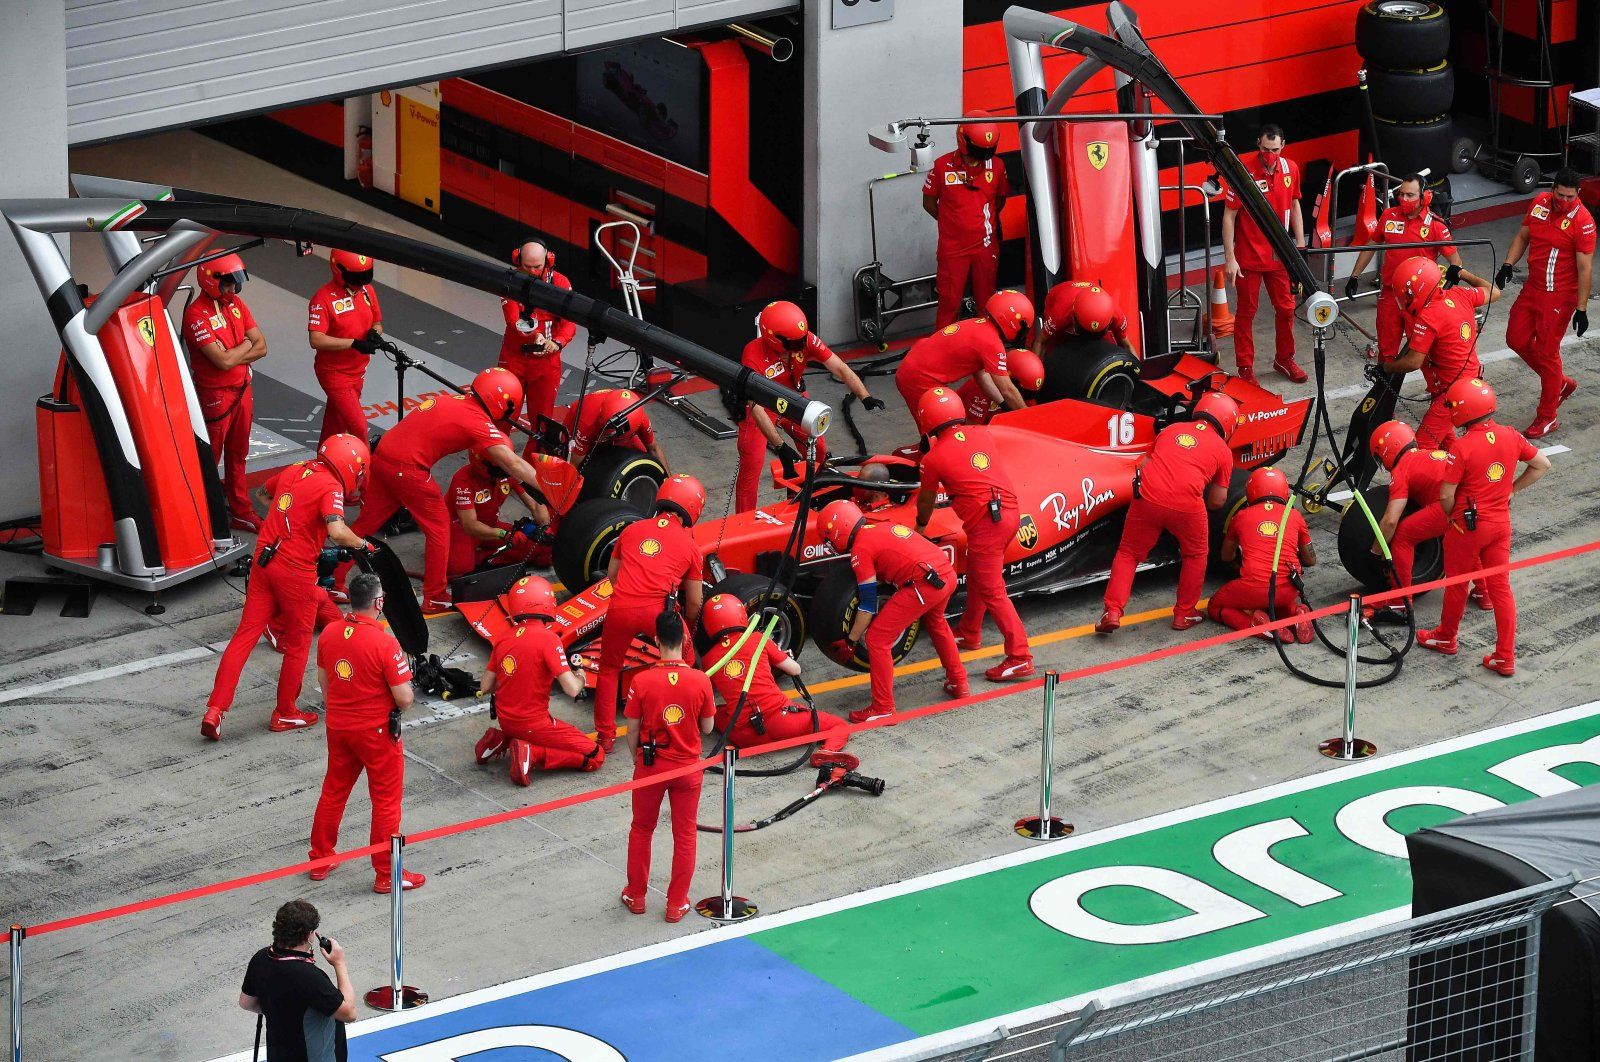 Ferrari driver Charles Leclerc's car seen in the pitlane ahead of the Austrian Grand Prix, Spielberg, Austria, July 2, 2020. (AFP Photo)